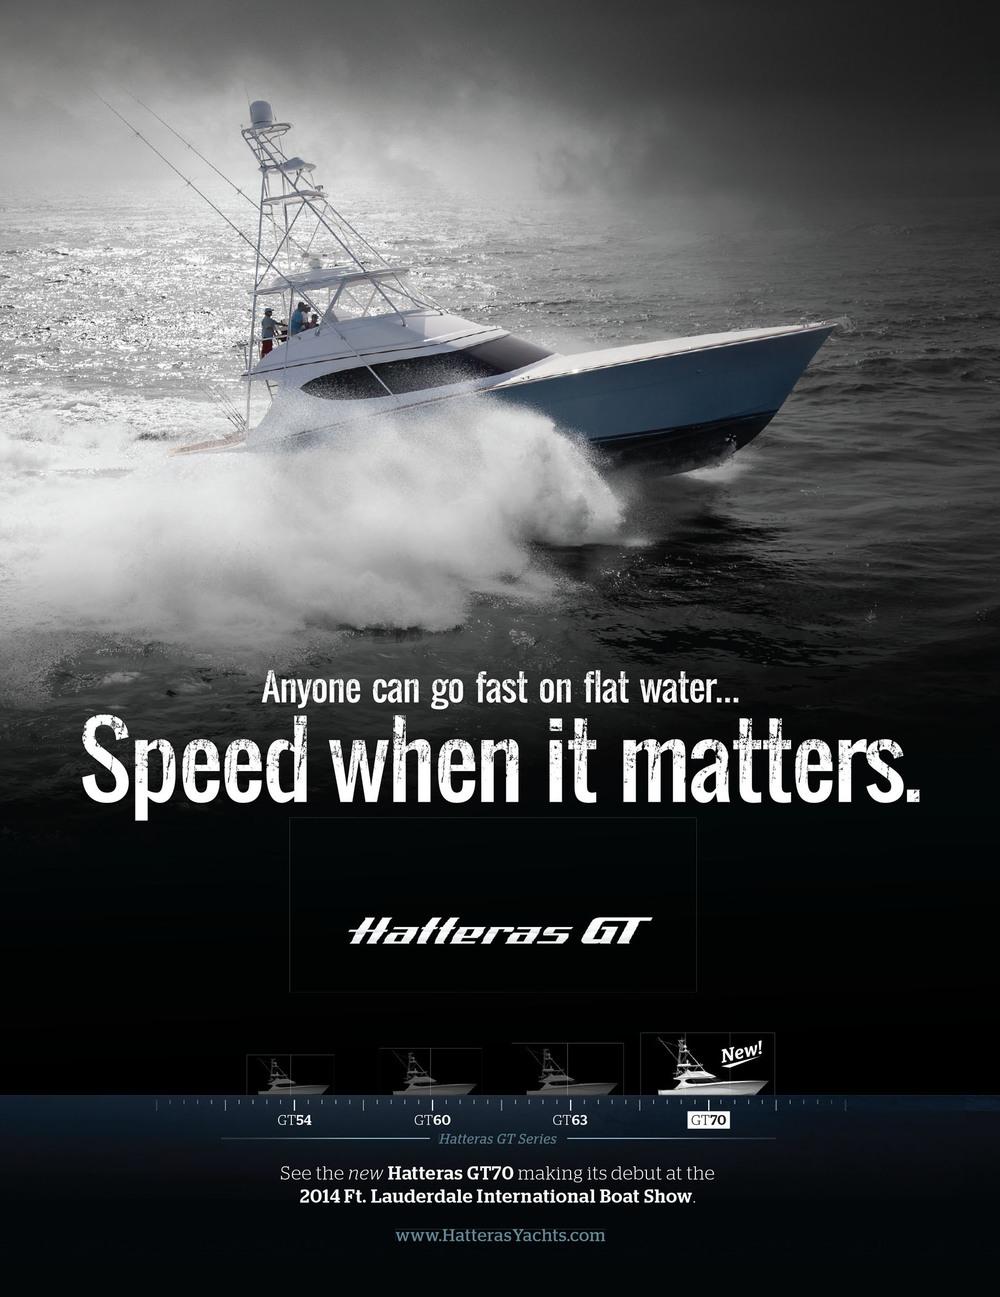 Hatteras GT Ad Jim Raycroft-1.jpg